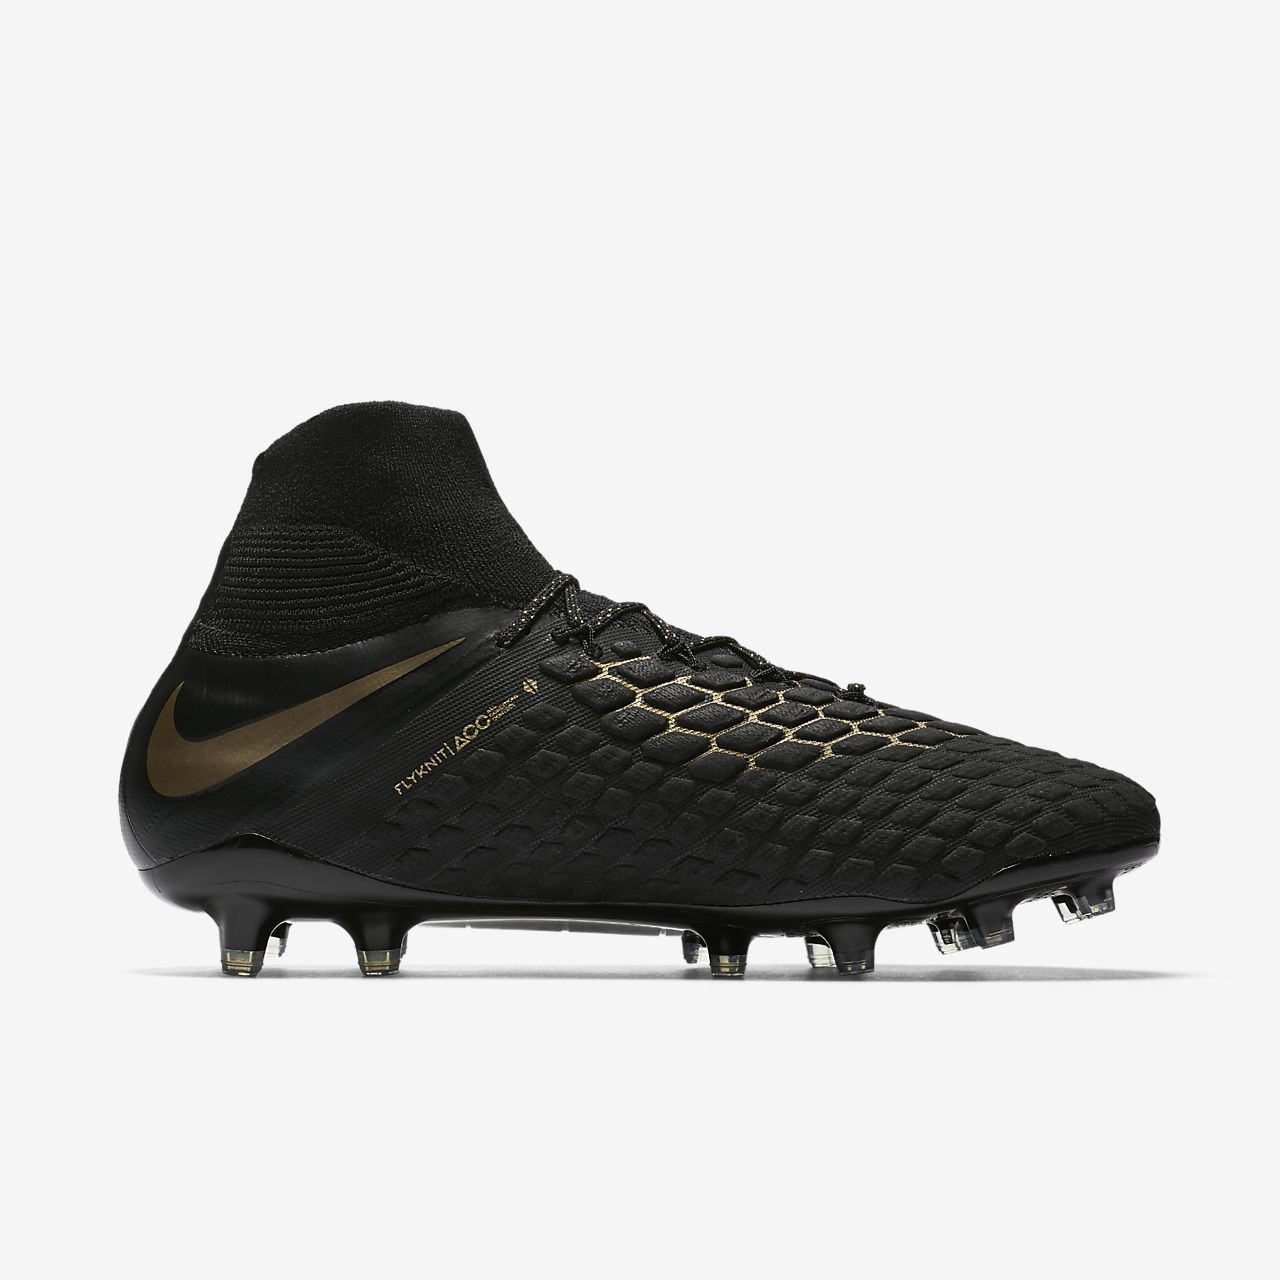 ... Nike Hypervenom III Elite Dynamic Fit Firm-Ground Soccer Cleat